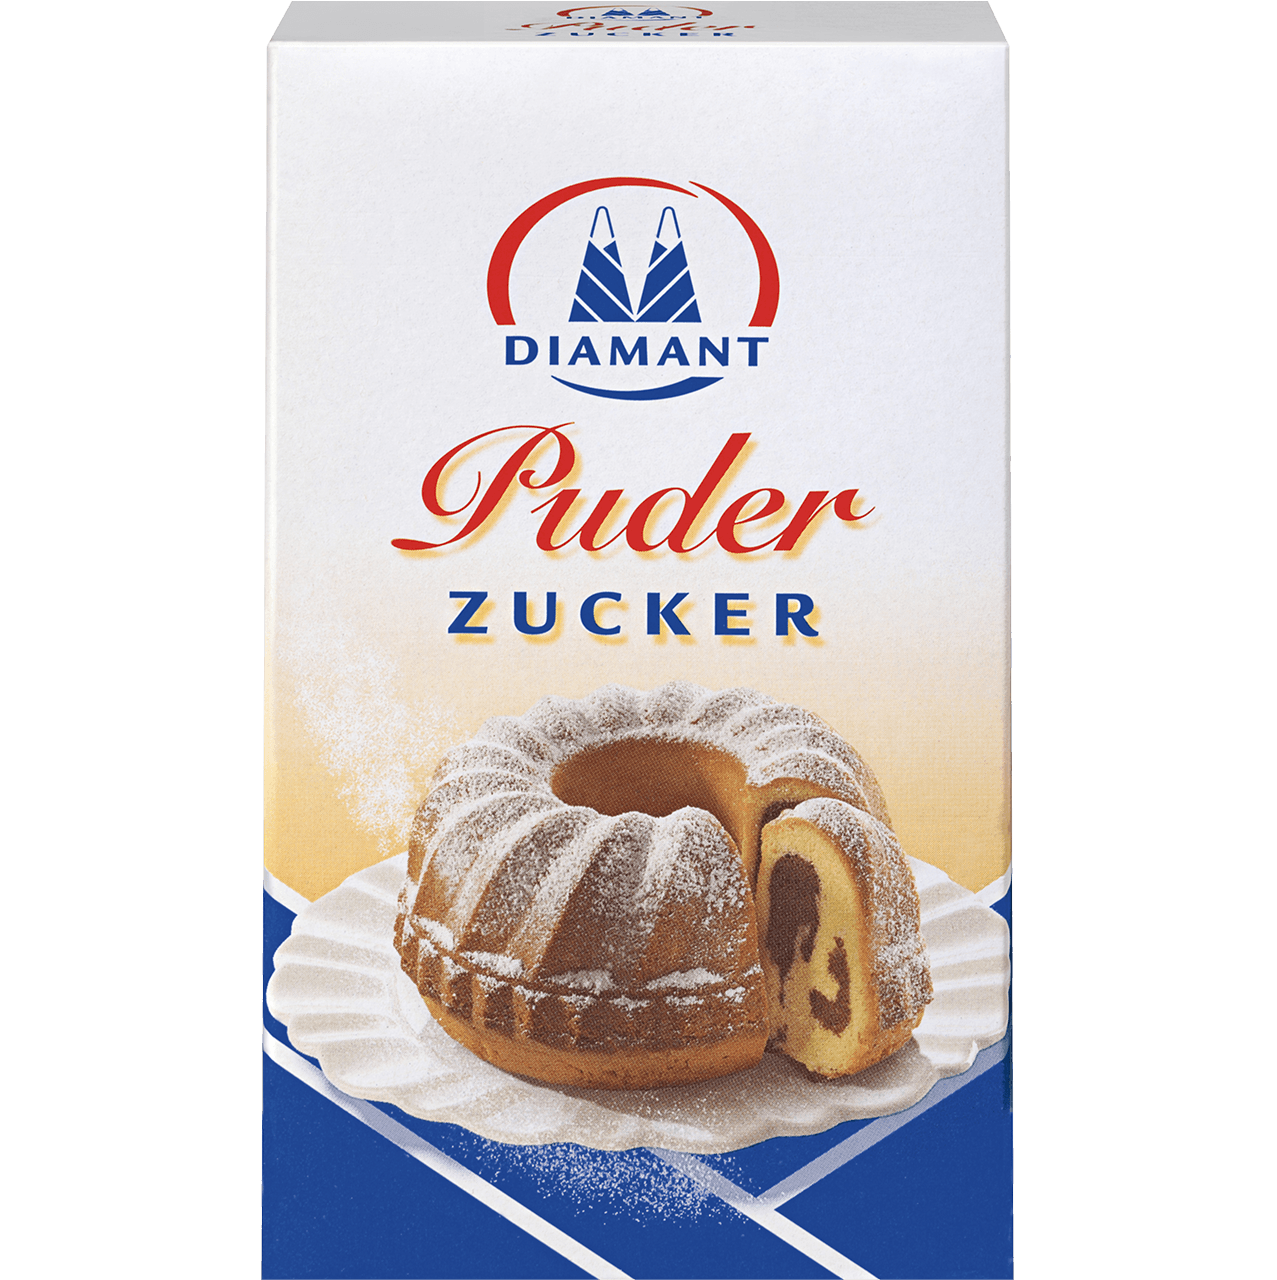 https://www.diamant-zucker.de/images/default-source/default-album/produkte/produkt-bilder/weißer-zucker/desktop/puderzucker_desktop6aaea2a1-22c6-4b11-93fa-df612af8223e.png?sfvrsn=5318a48f_3